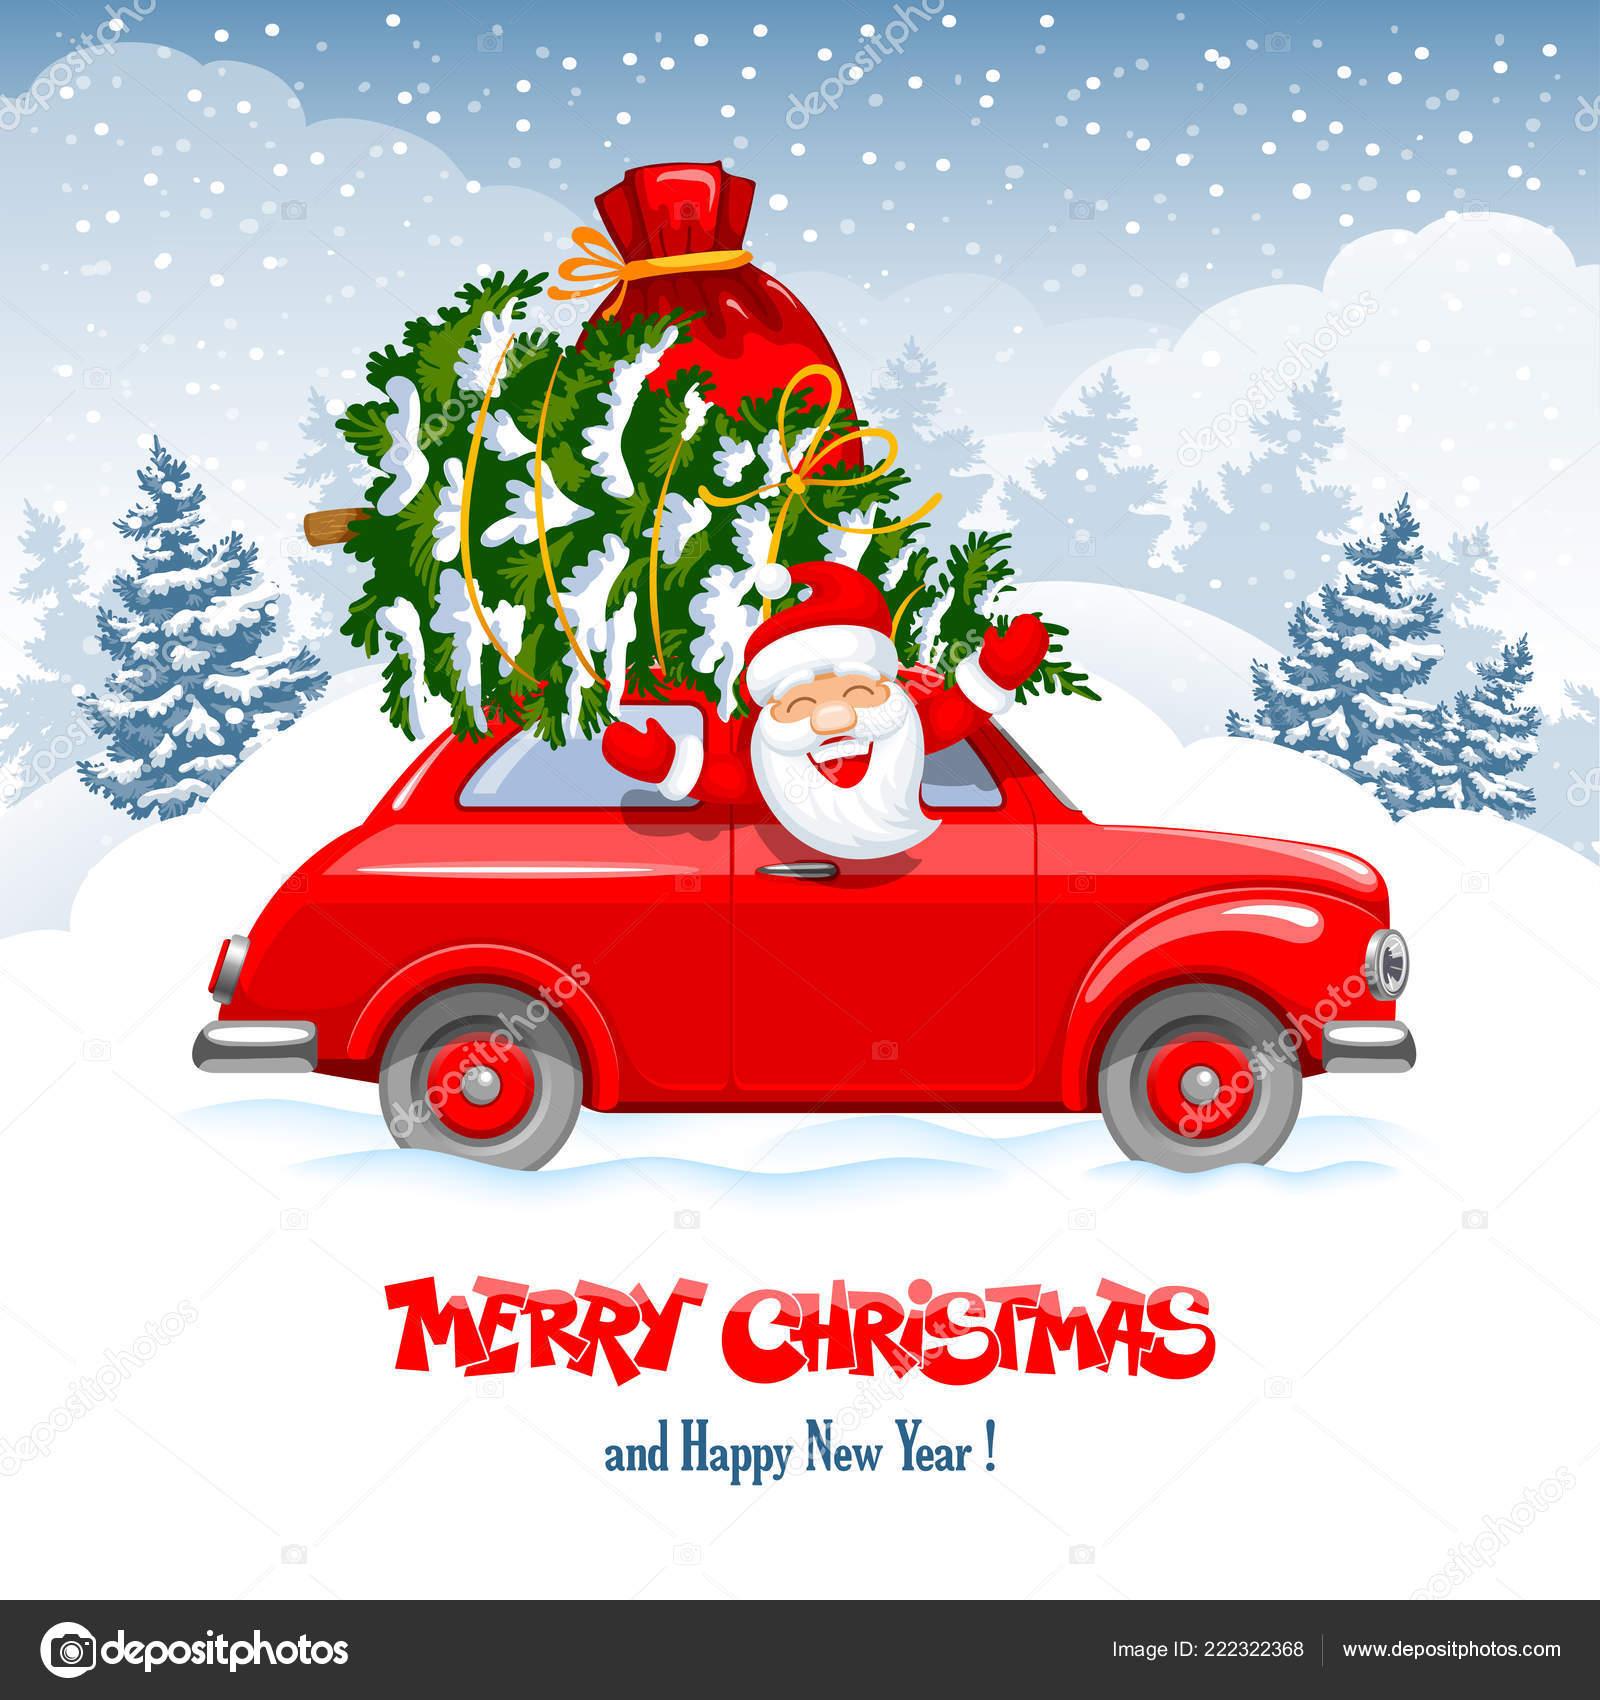 Merry Christmas Happy New Year Greeting Cute Cheerful Santa Claus ...